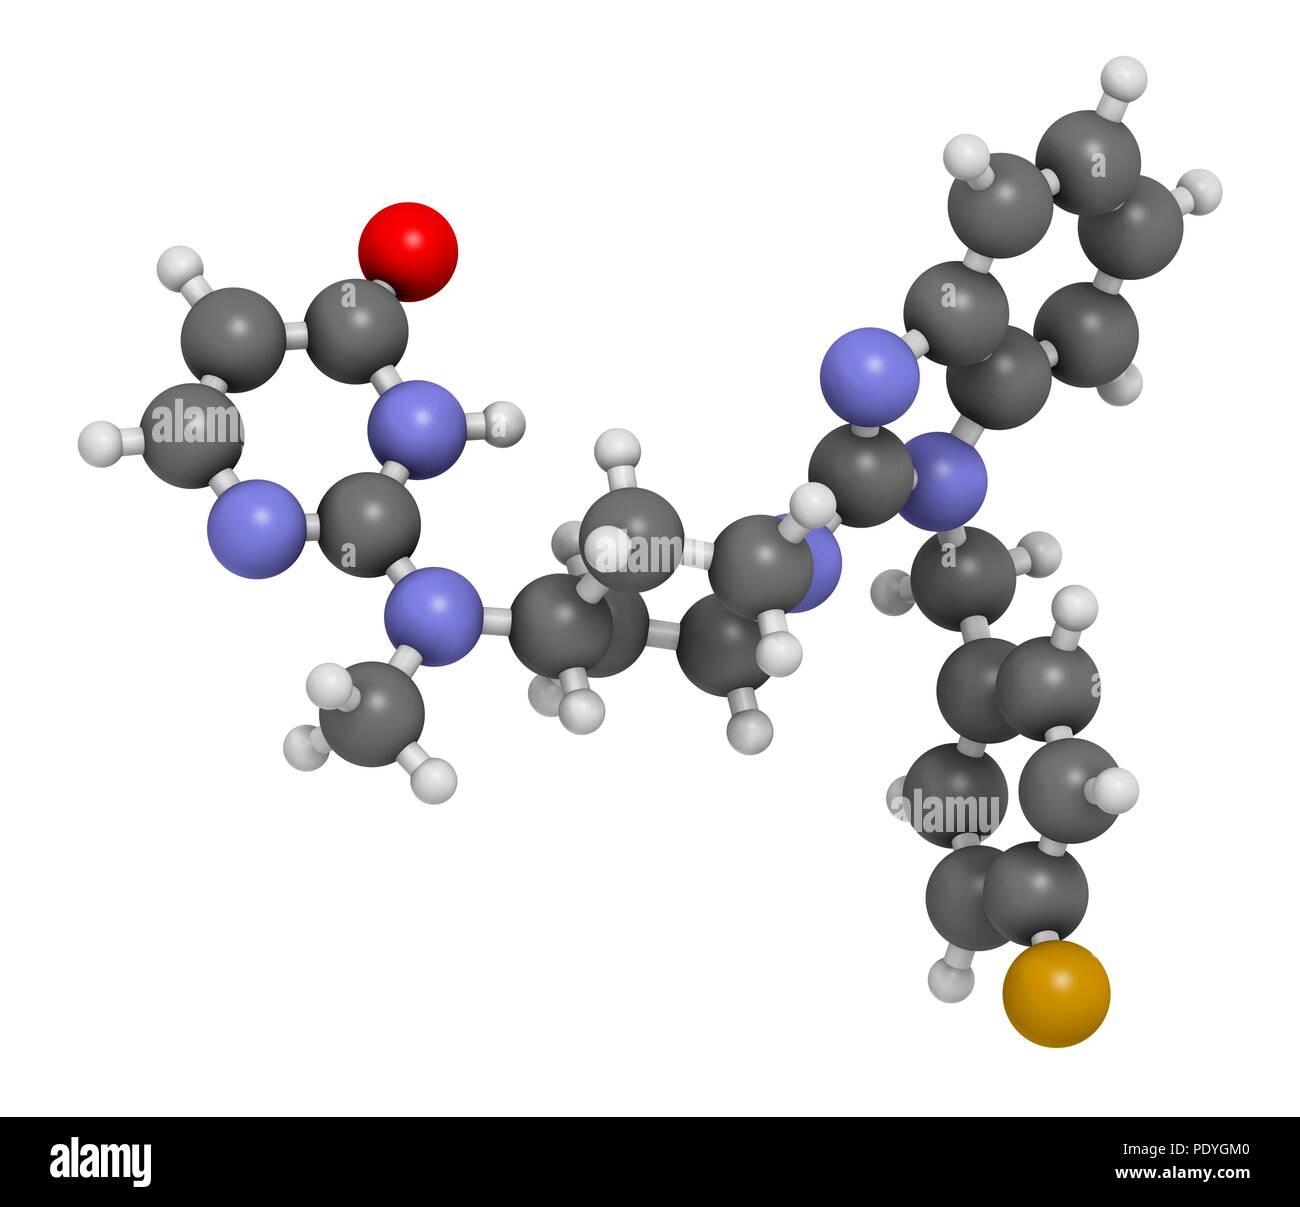 3d Oxygen Atom Diagram Spheres Represent Carbon Atoms Wire Data Fluorine Atomic Structure Stock Photos Rh Alamy Com